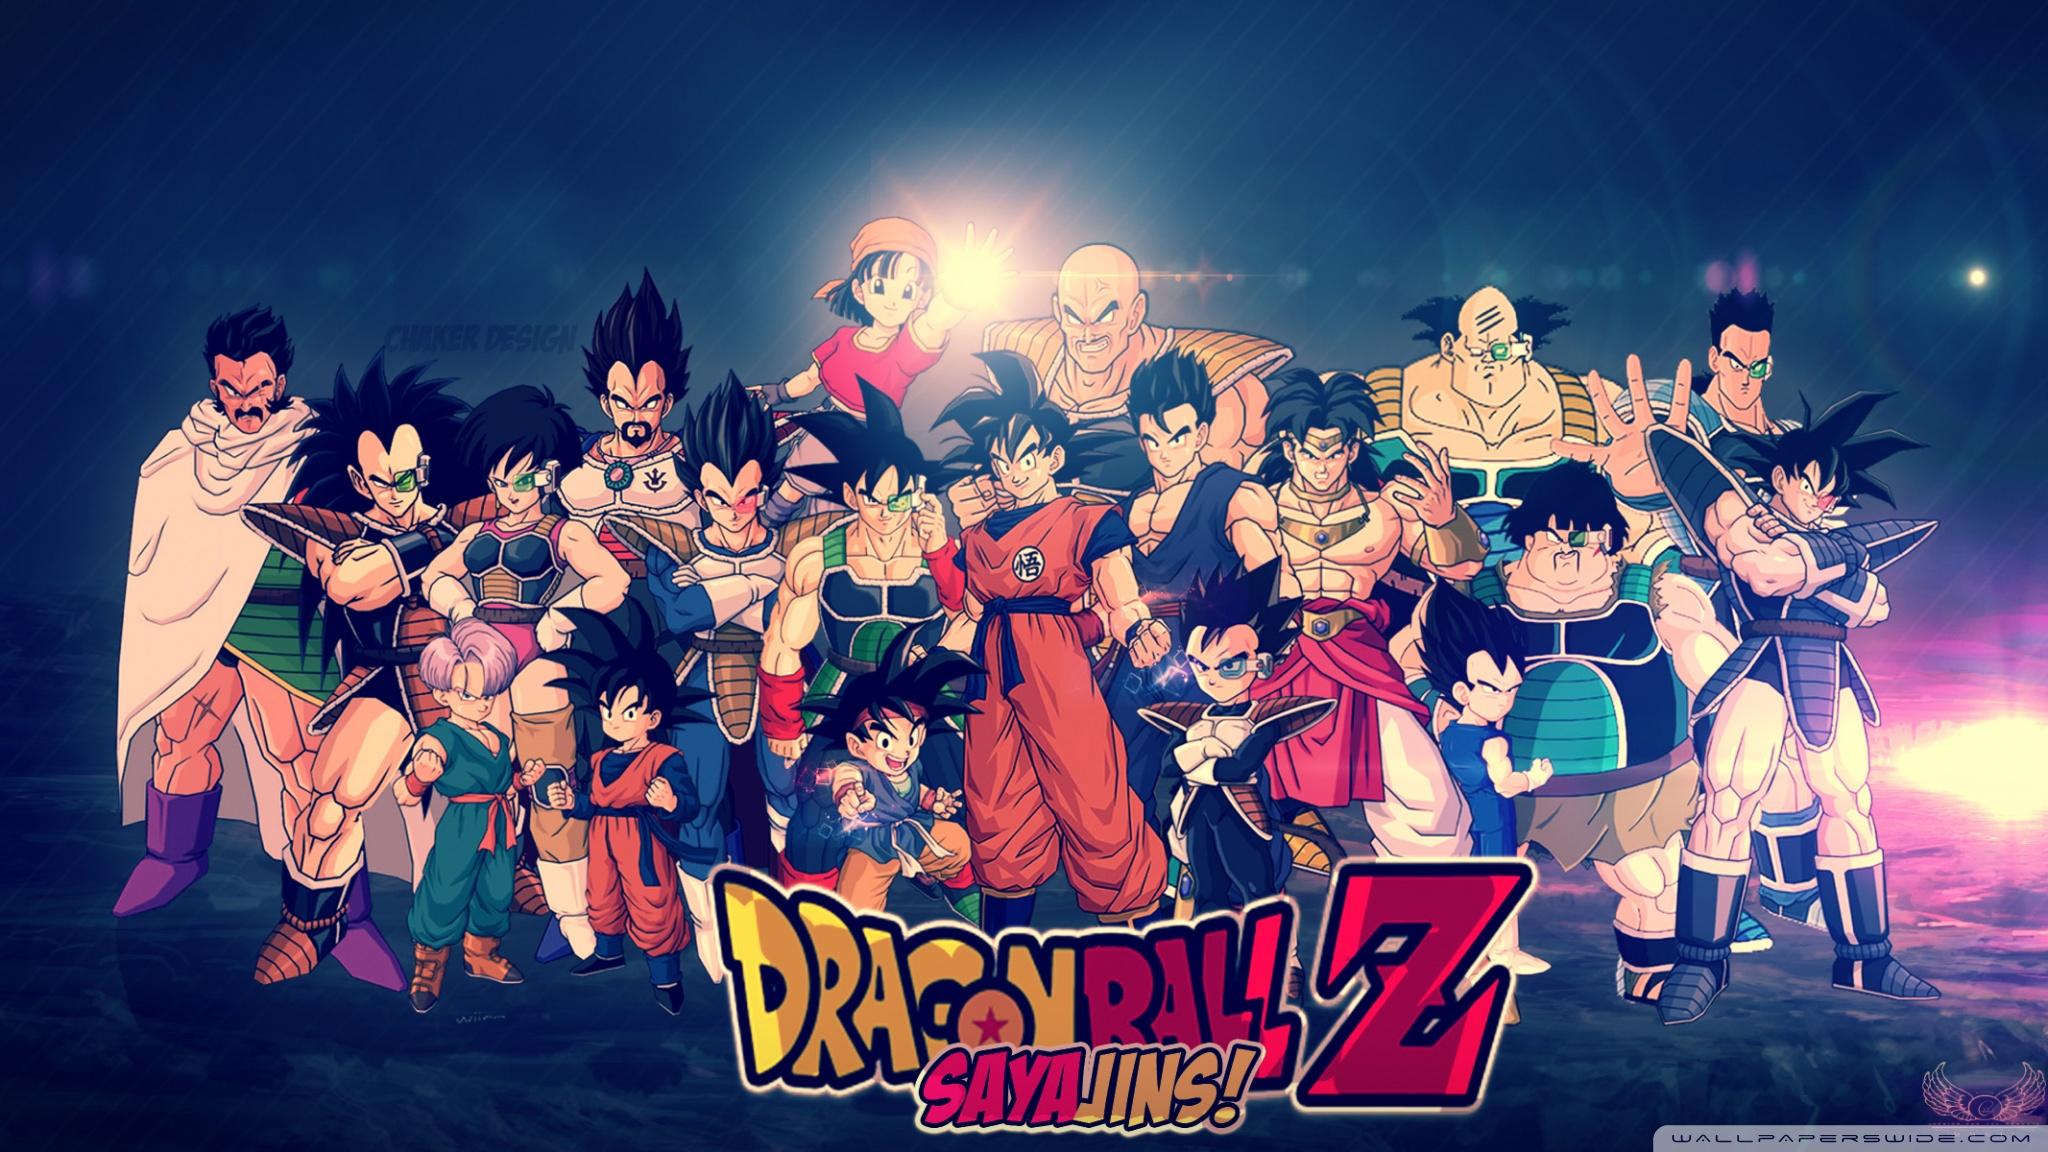 74 Dragon Ball Z Wallpaper Hd On Wallpapersafari